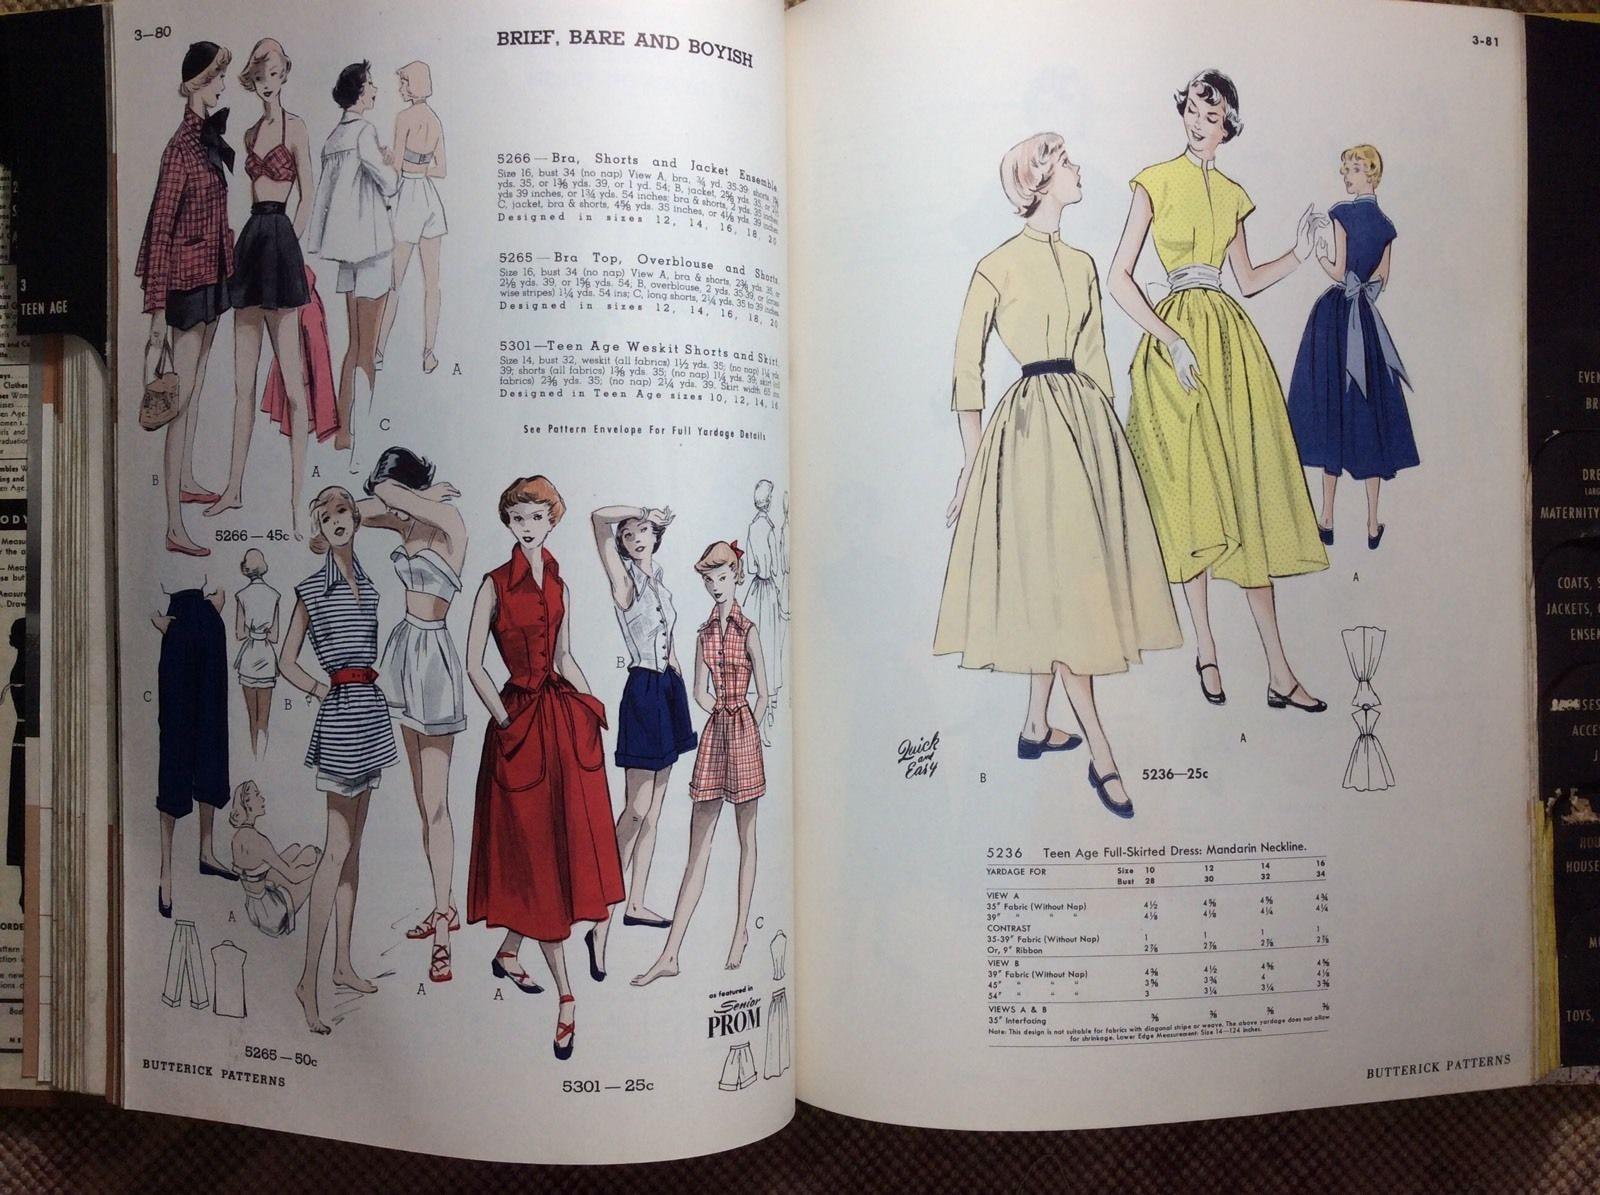 Vtg September 1950 Butterick Sewing Pattern Counter Catalog Hard ...